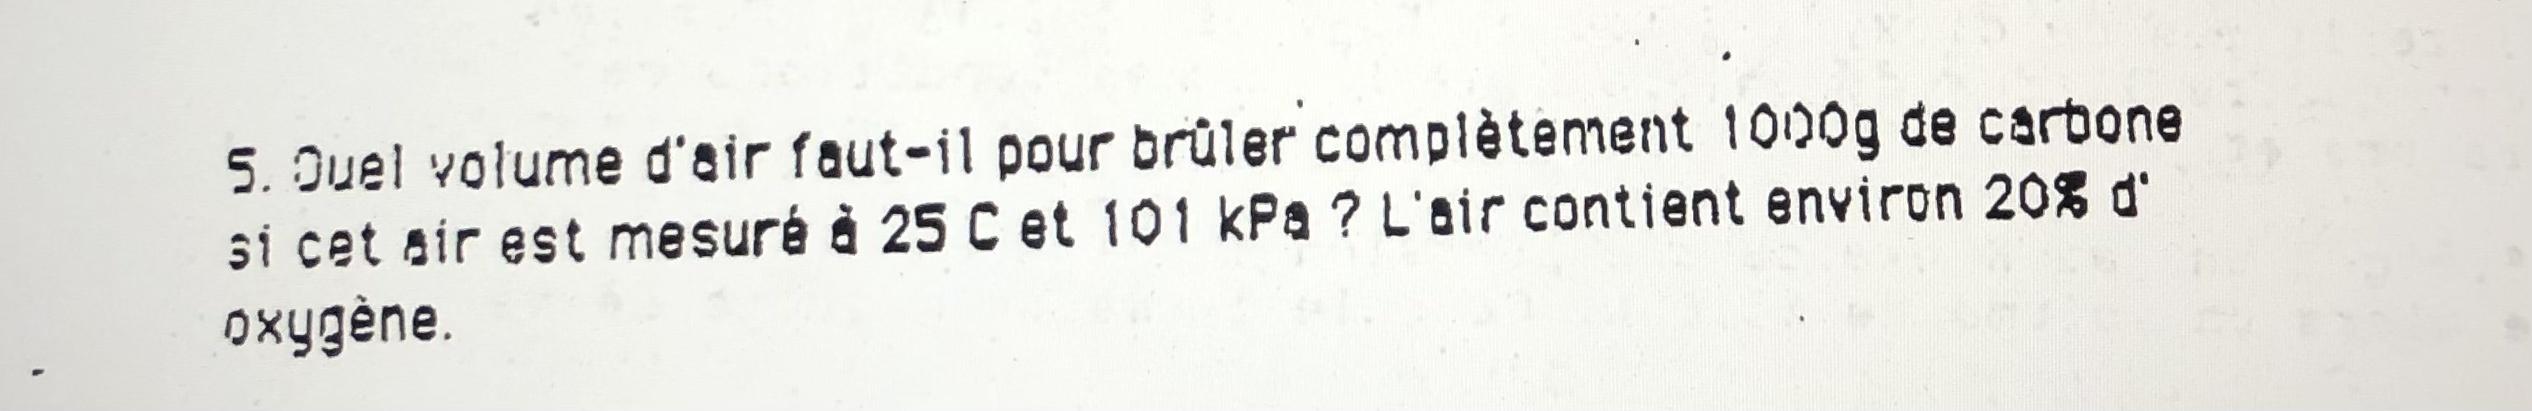 D0991CC6-801D-4C4C-BCEF-44E64BA42E31.jpeg